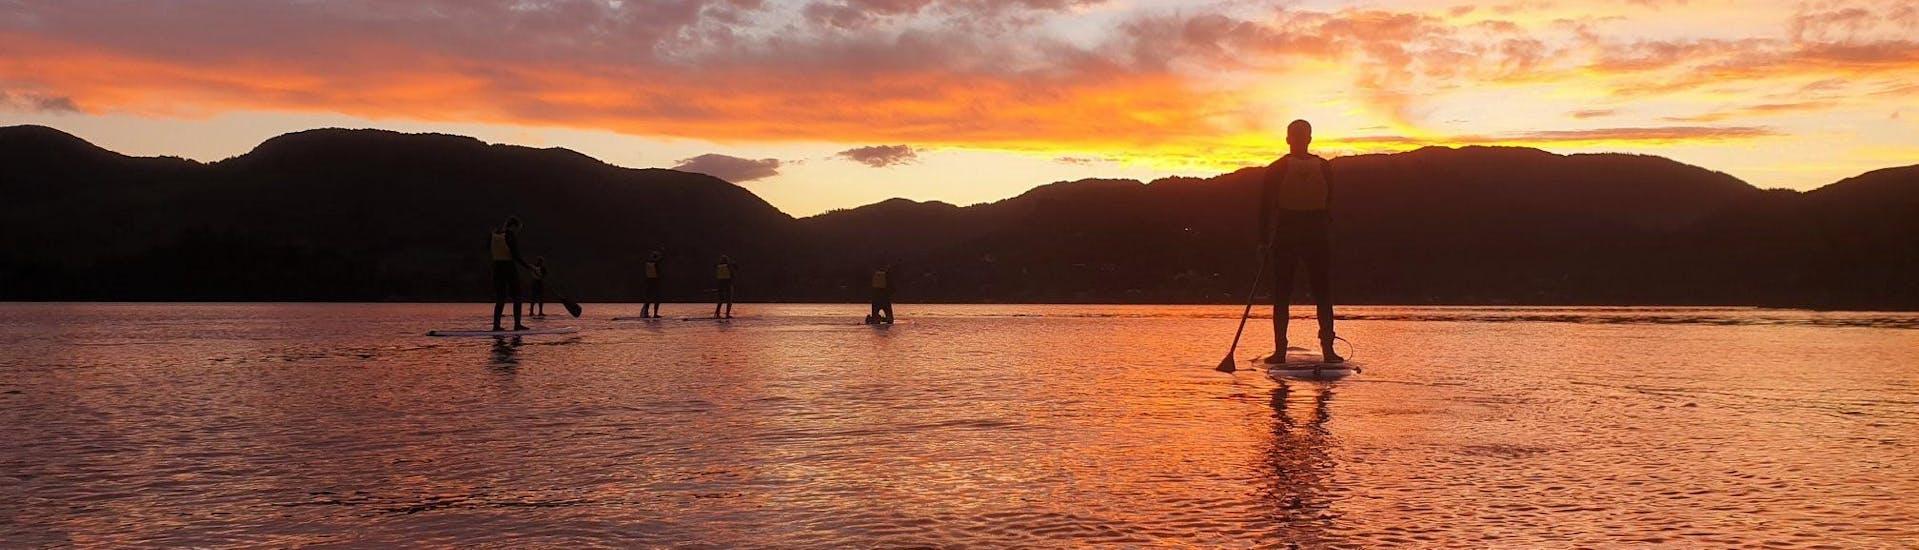 Paddle Board Rotorua - Glow Worm Tour Summer incl. Transfer